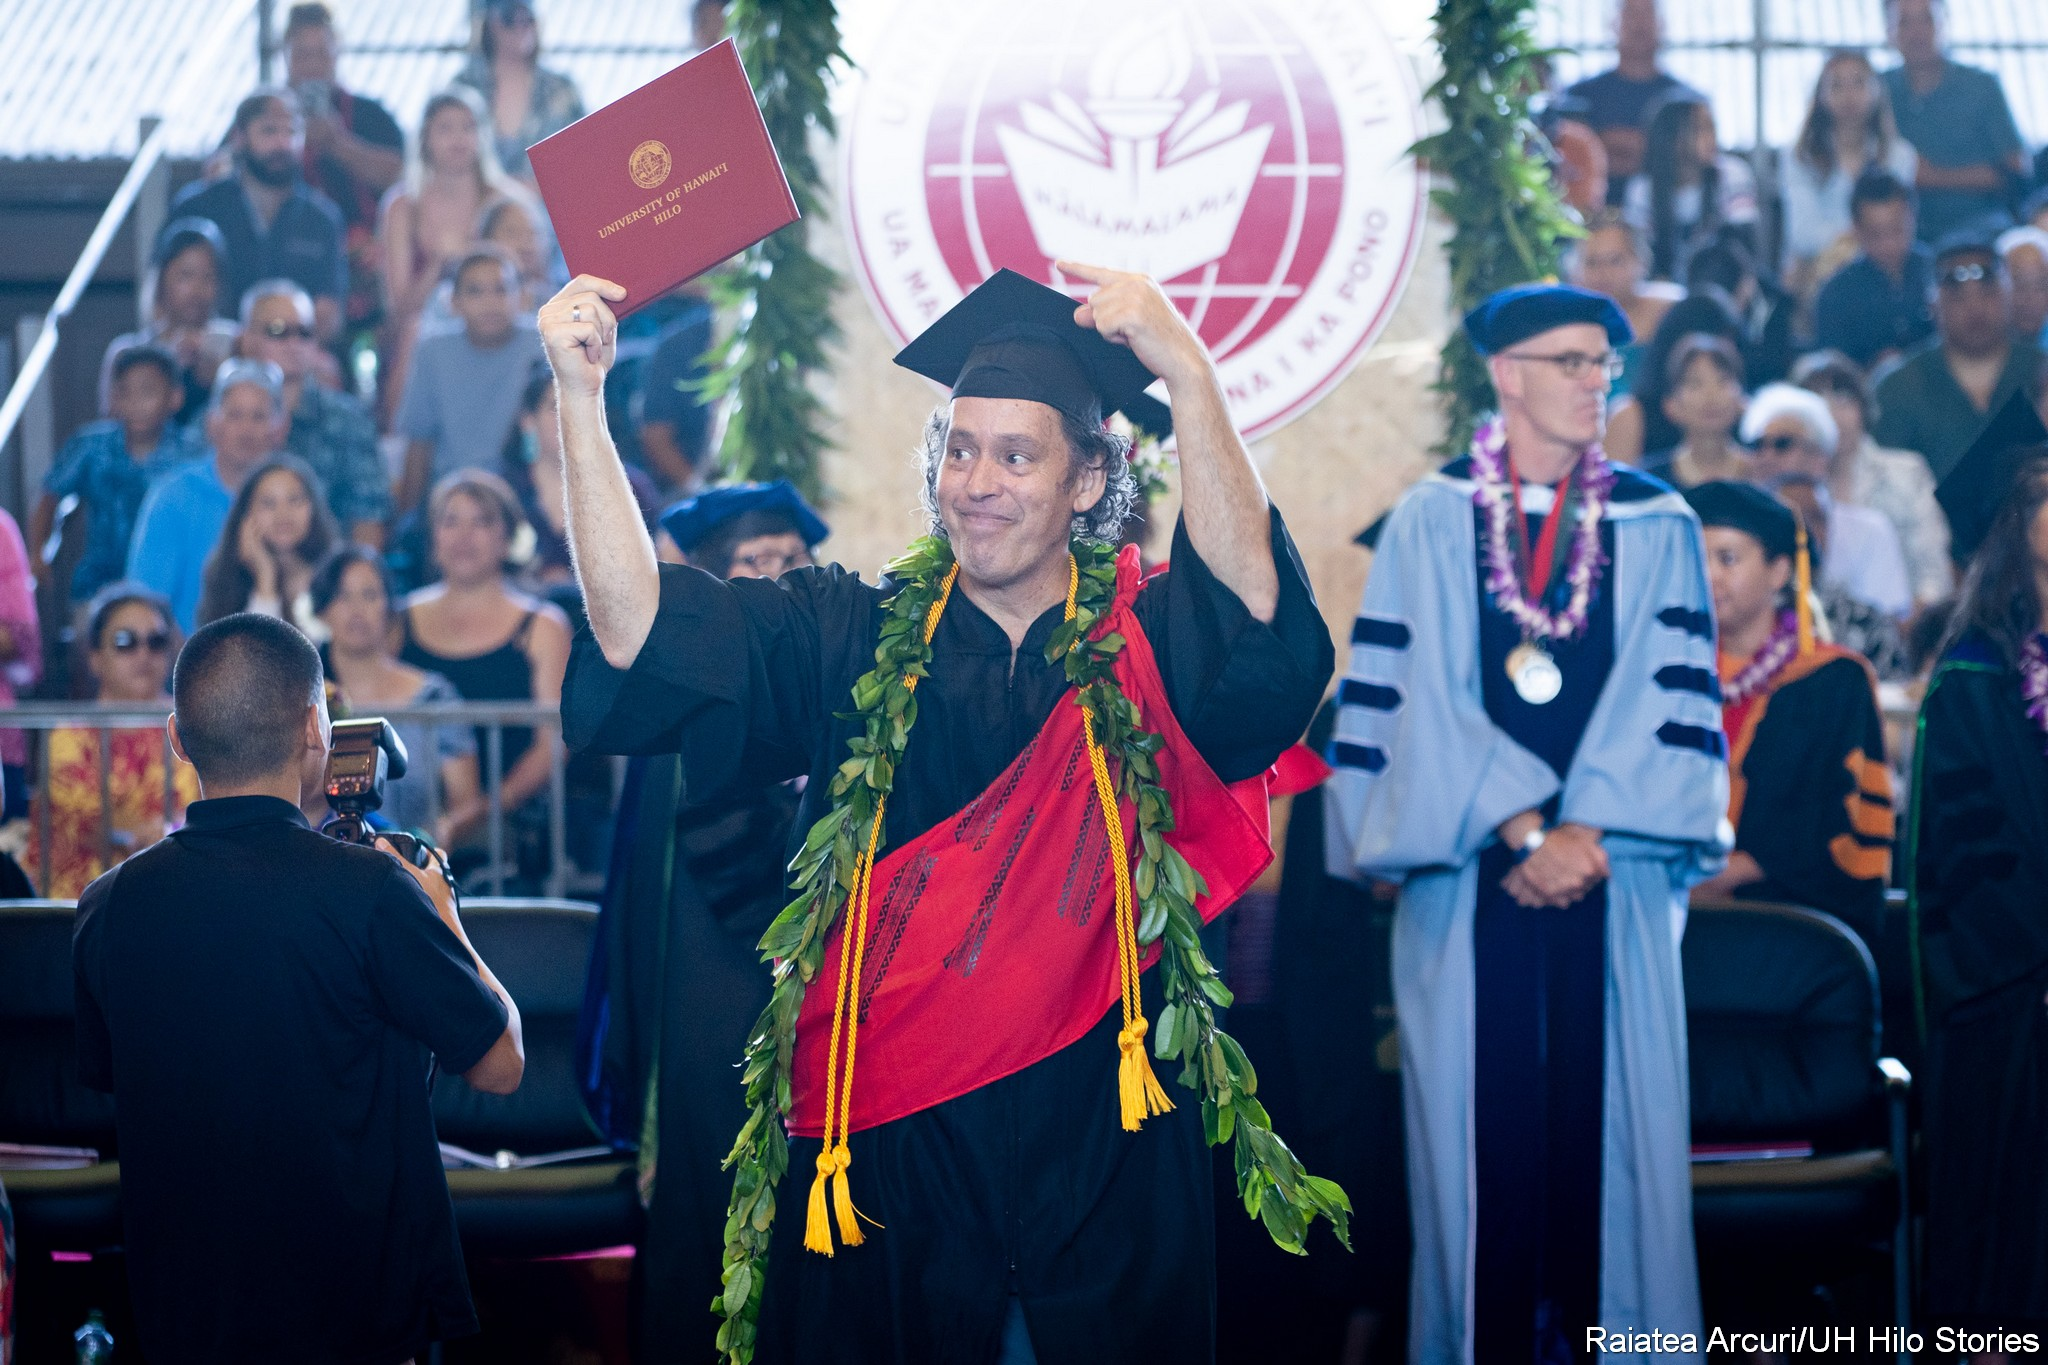 Male graduate, diploma held overhead, leaving dais.